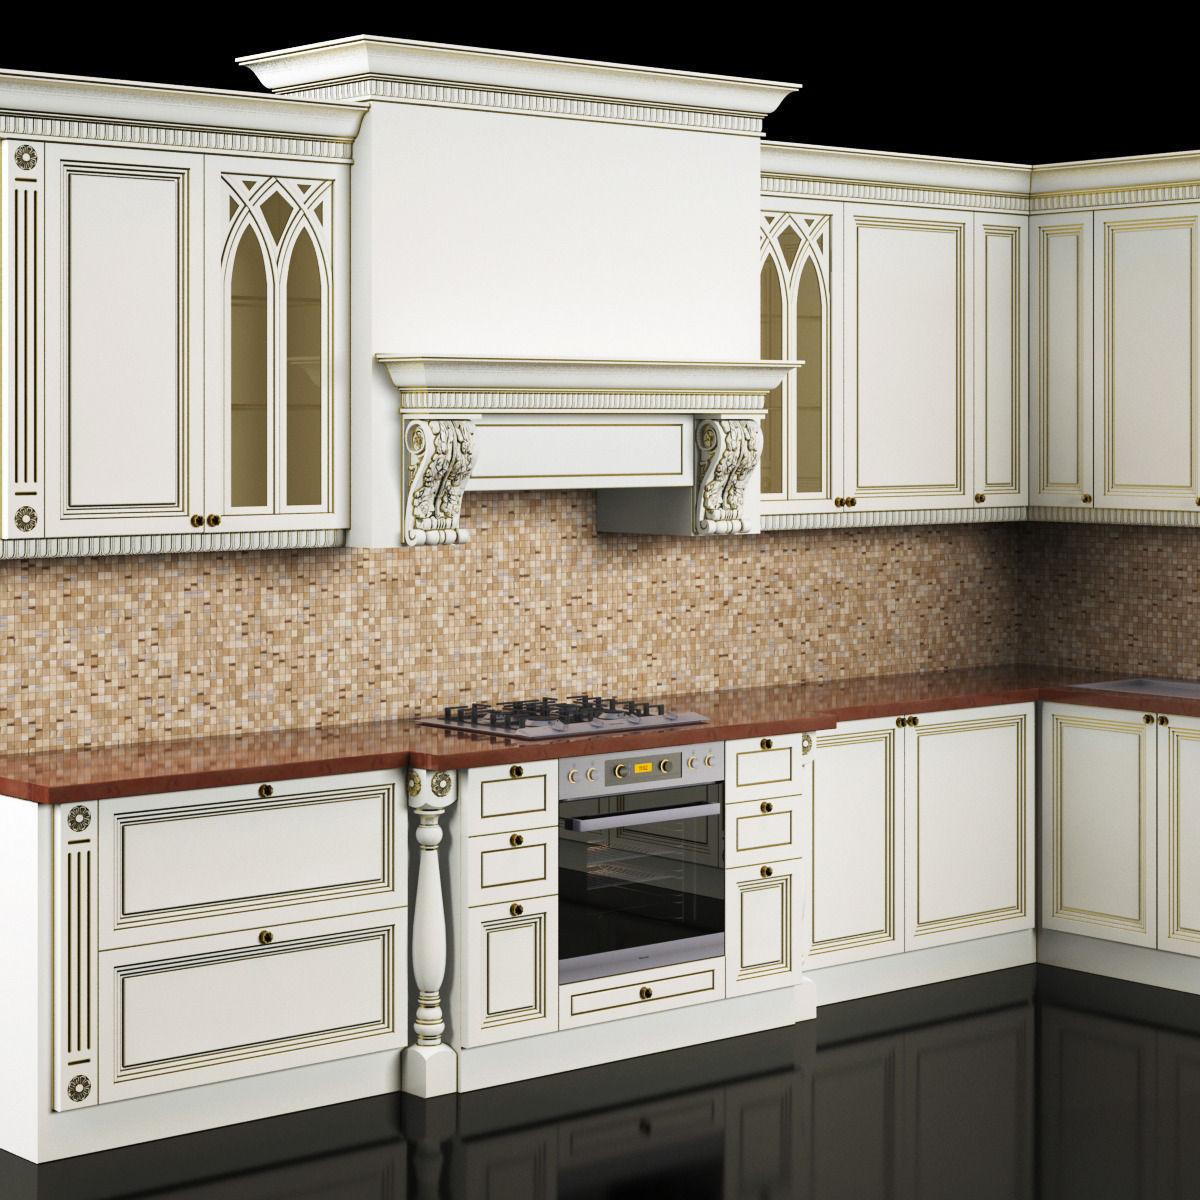 classic kitchen 3D Model MAX | CGTrader.com on Model Kitchen  id=78219